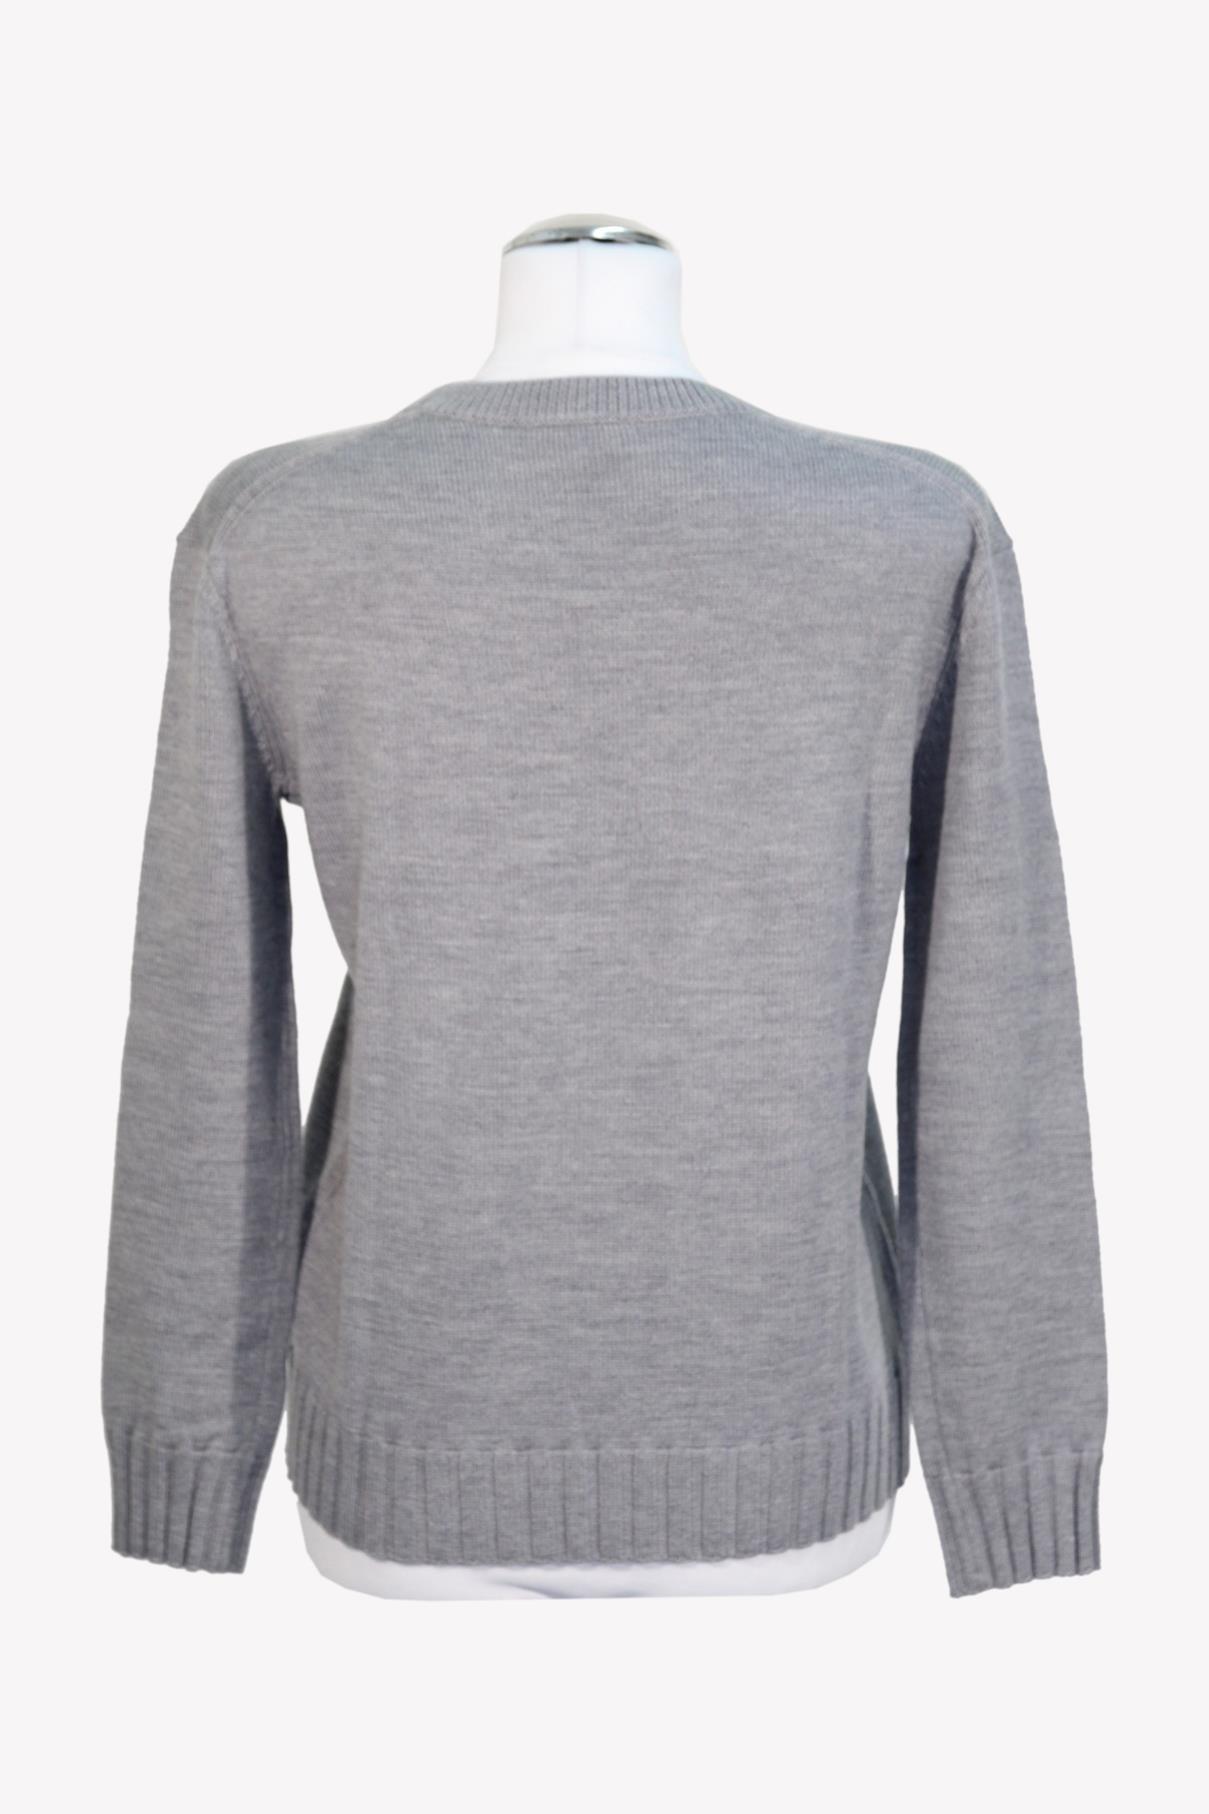 Pullover in Grau Kenzo